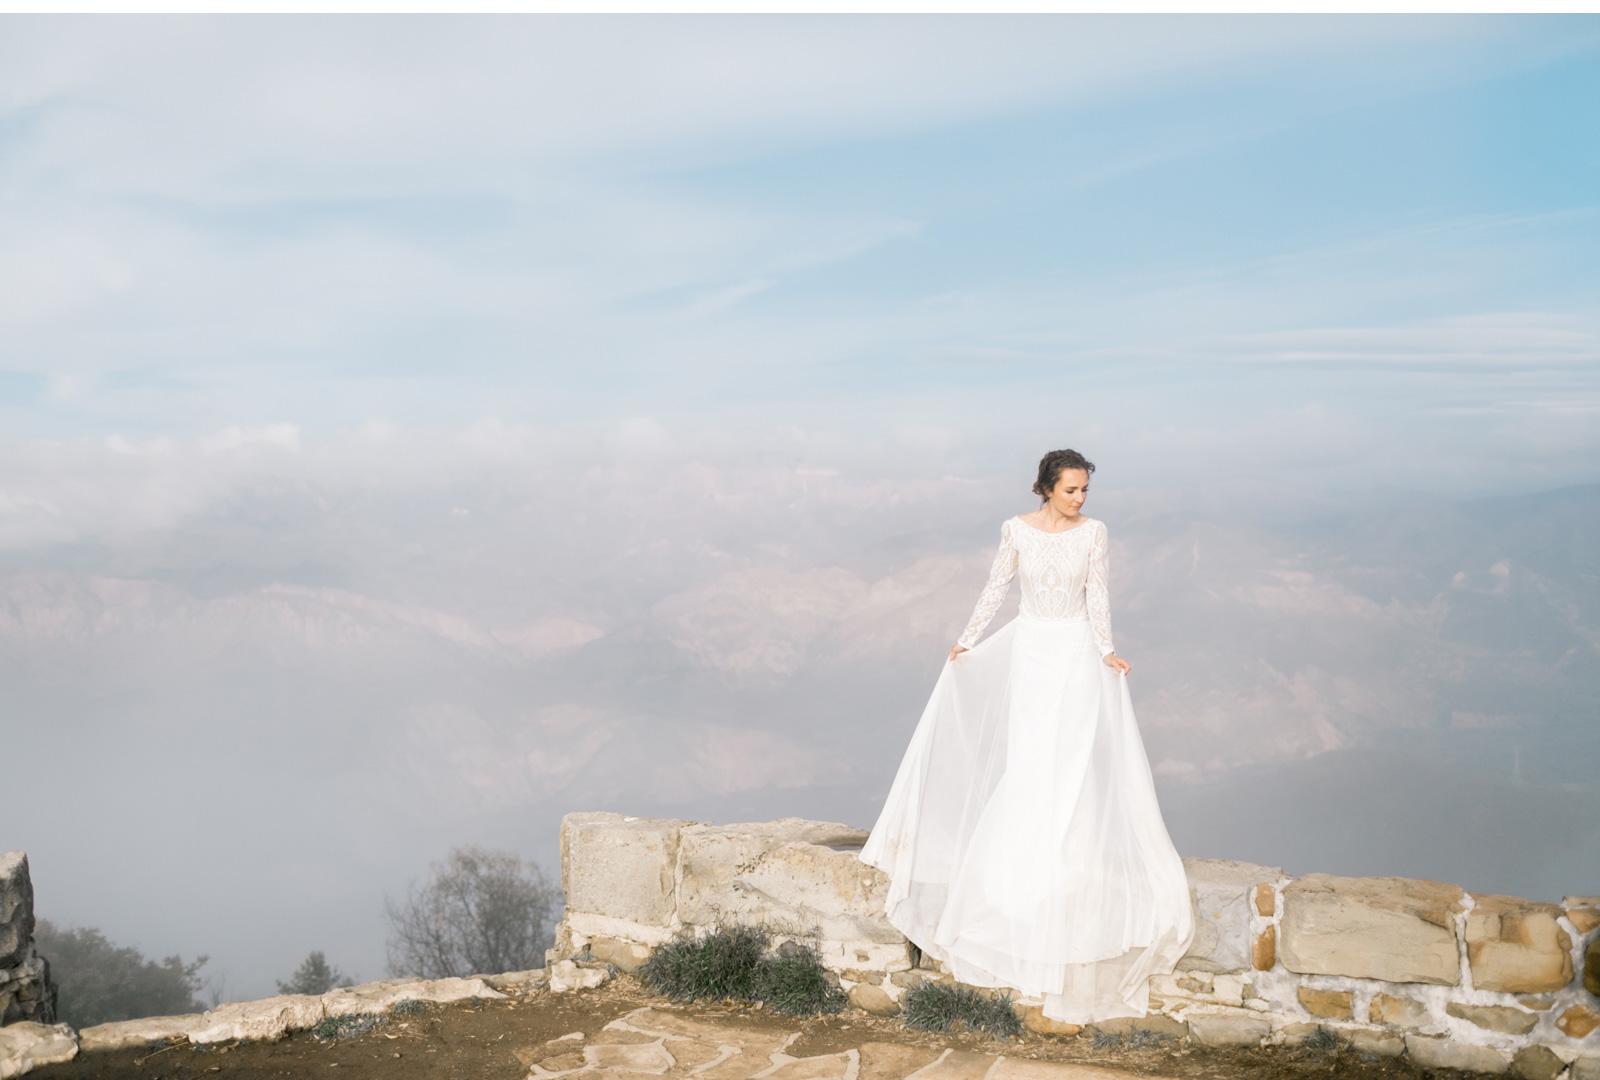 Knapps-Castle-Style-Me-Pretty-Santa-Barbara-Natalie-Schutt-Photography_12.jpg